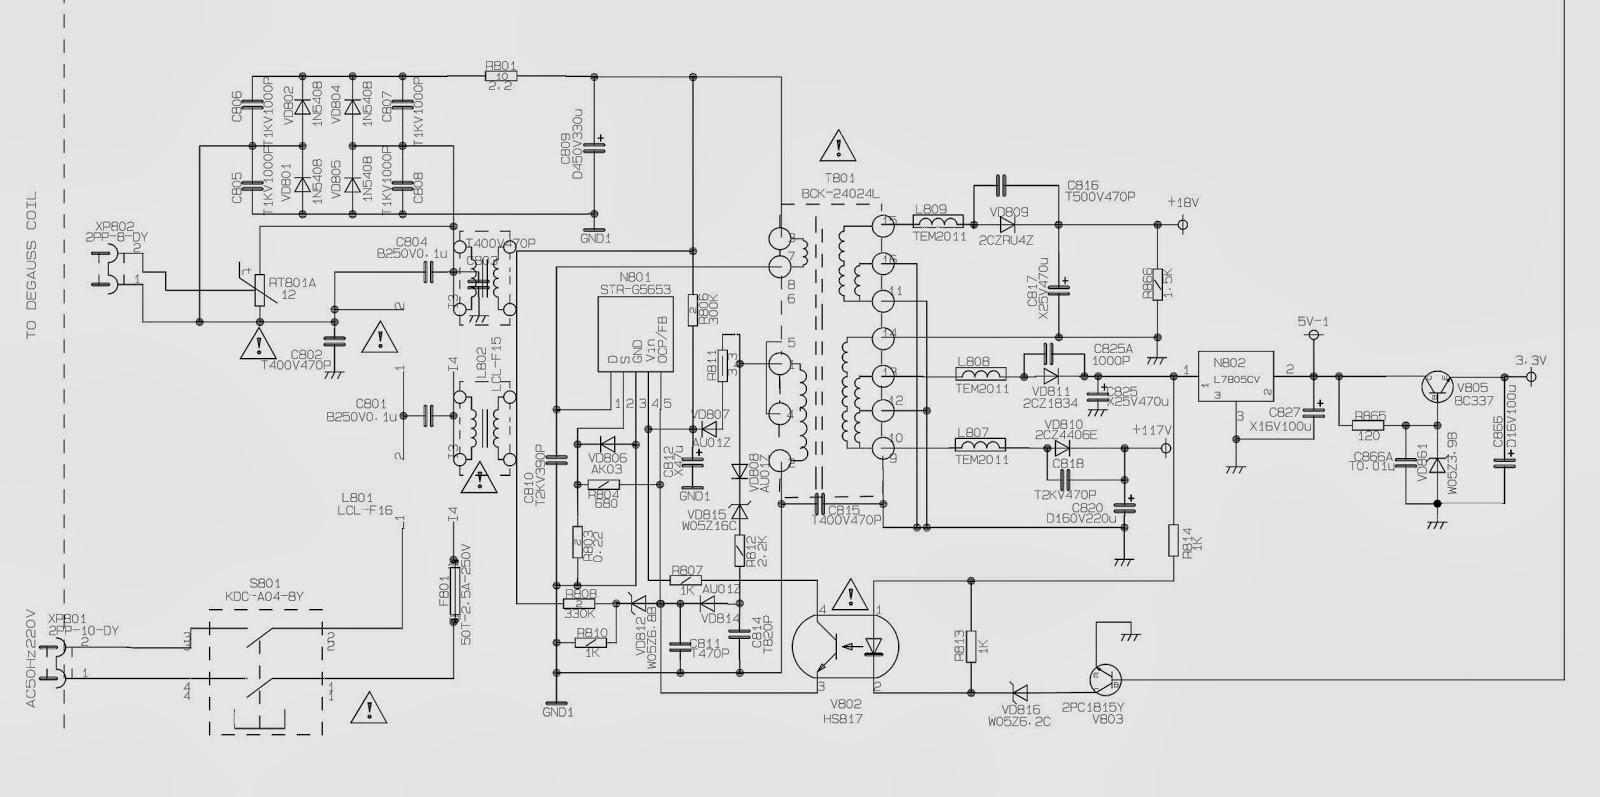 Air Handler Wiring Diagram Air Handler Suspension Wiring